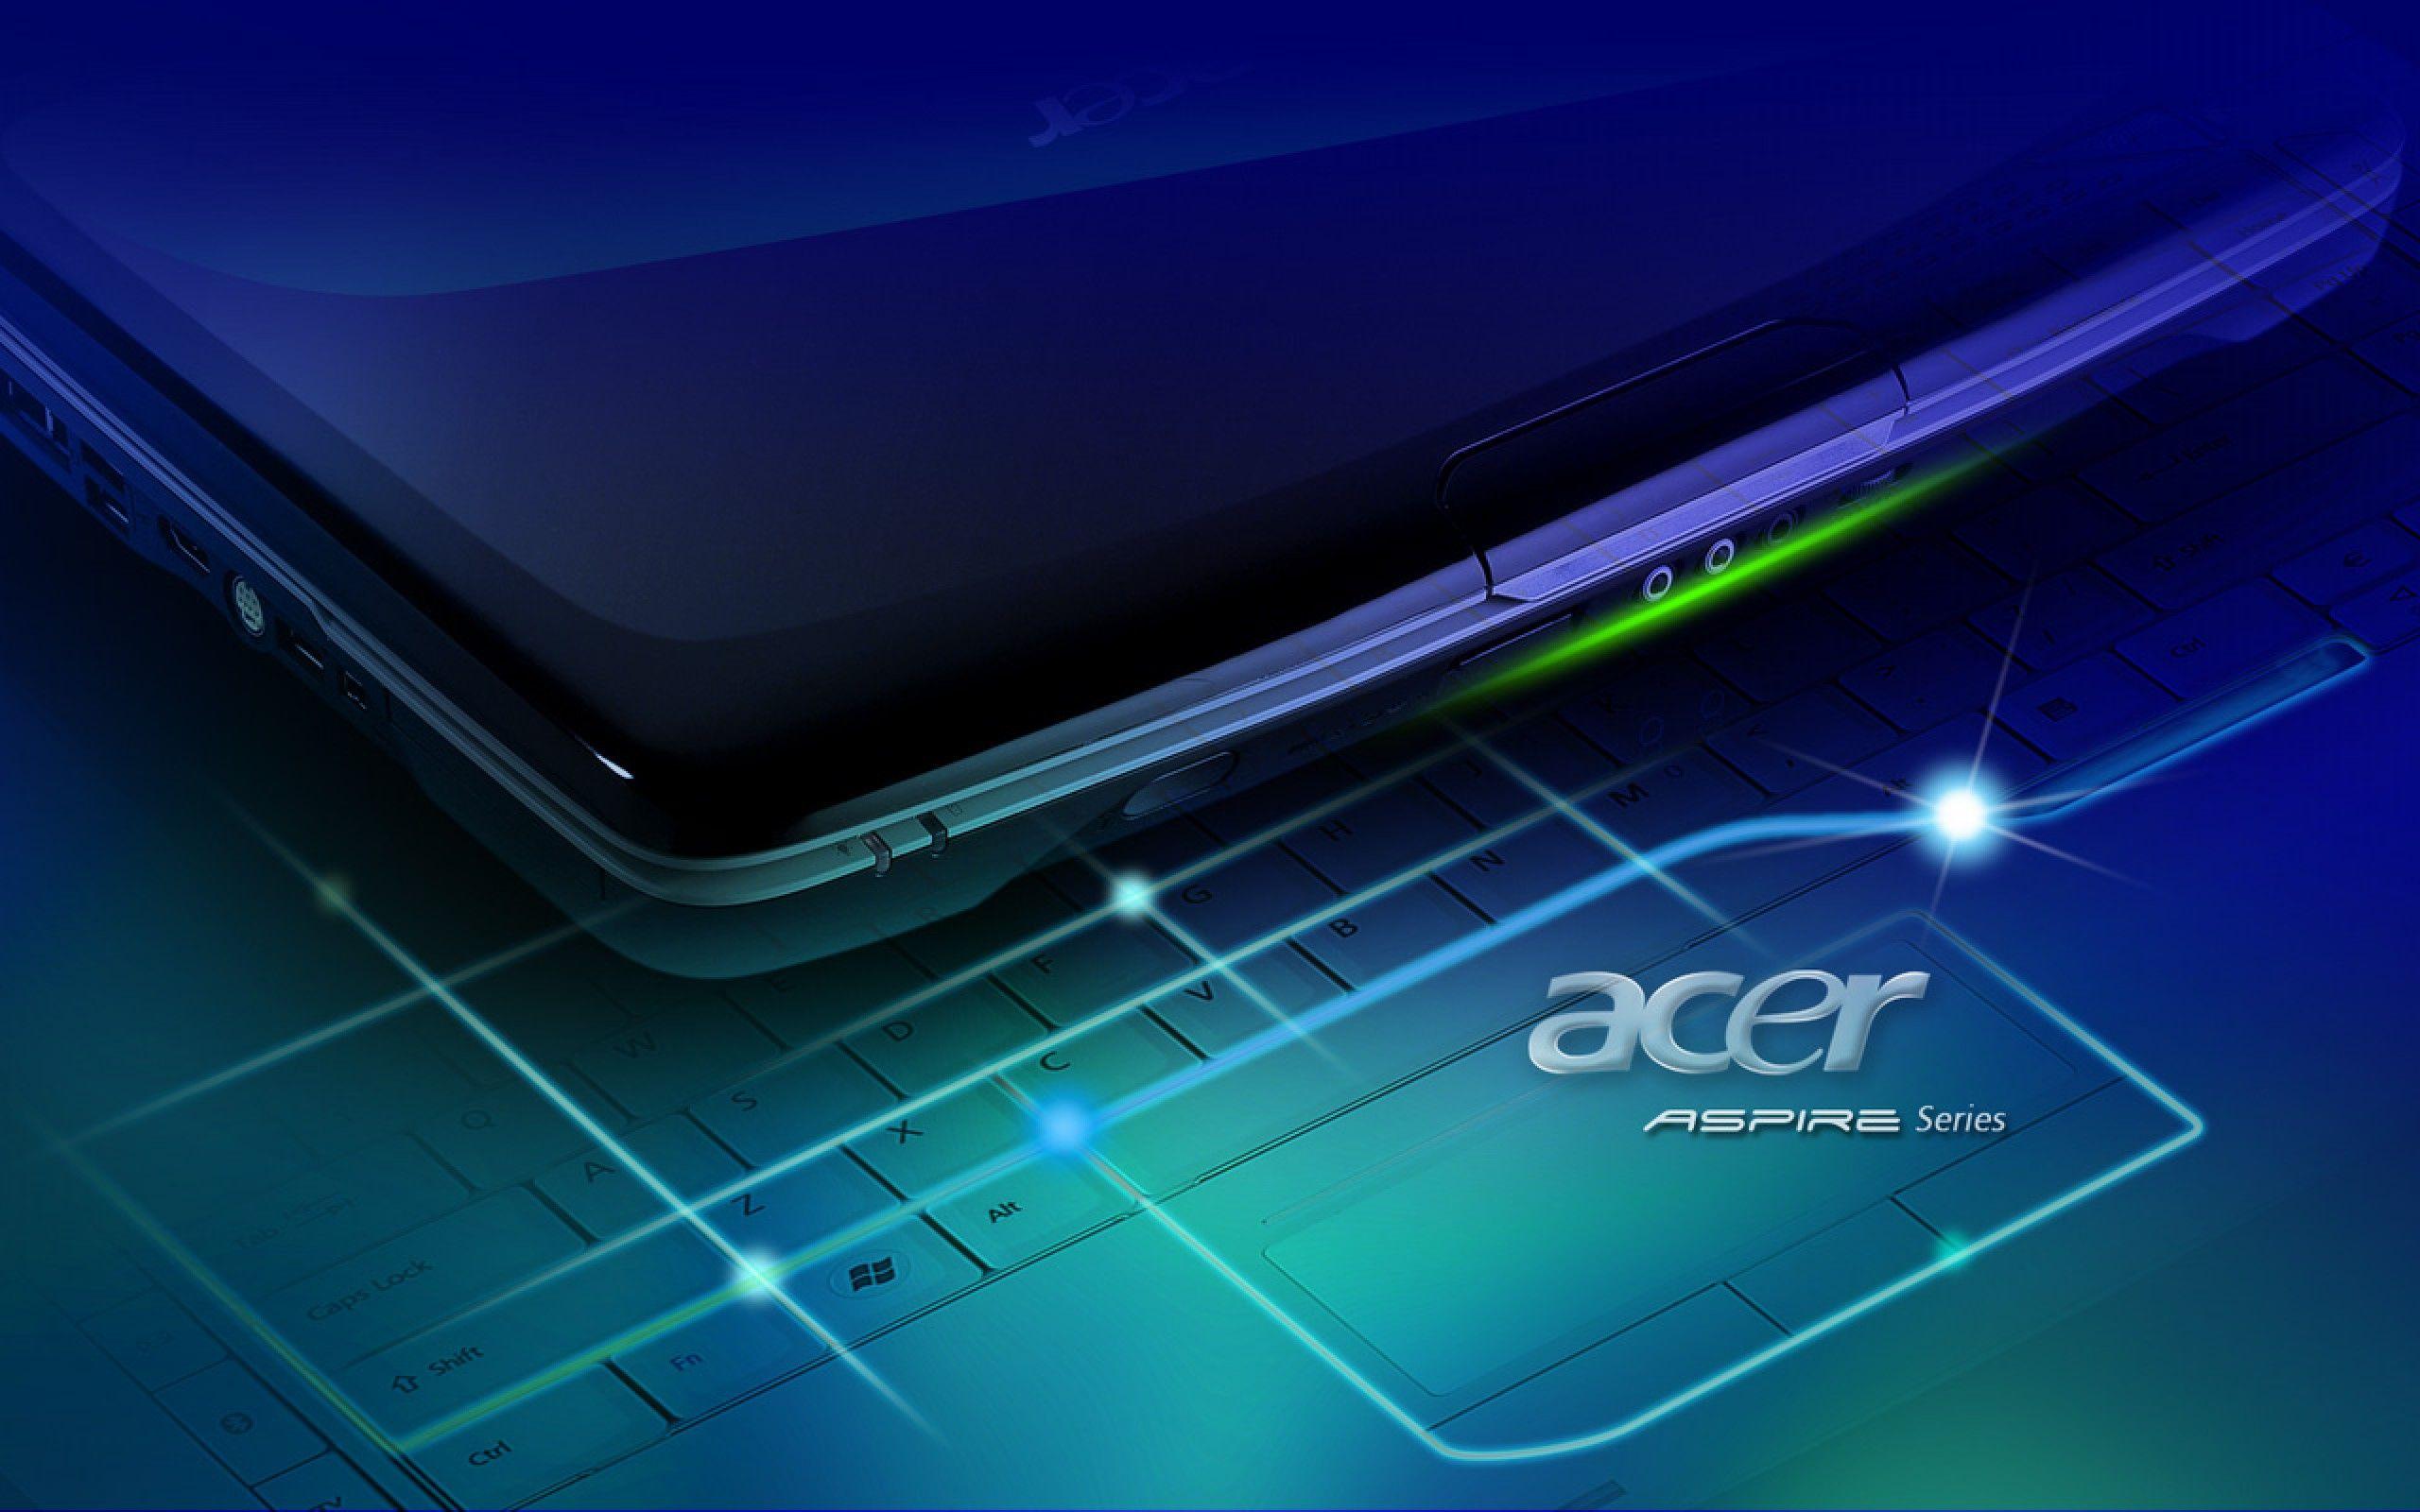 Acer Wallpaper 1080p Hd 1920x1080 Wallpapersafari Hd Wallpapers For Laptop Acer Desktop Acer